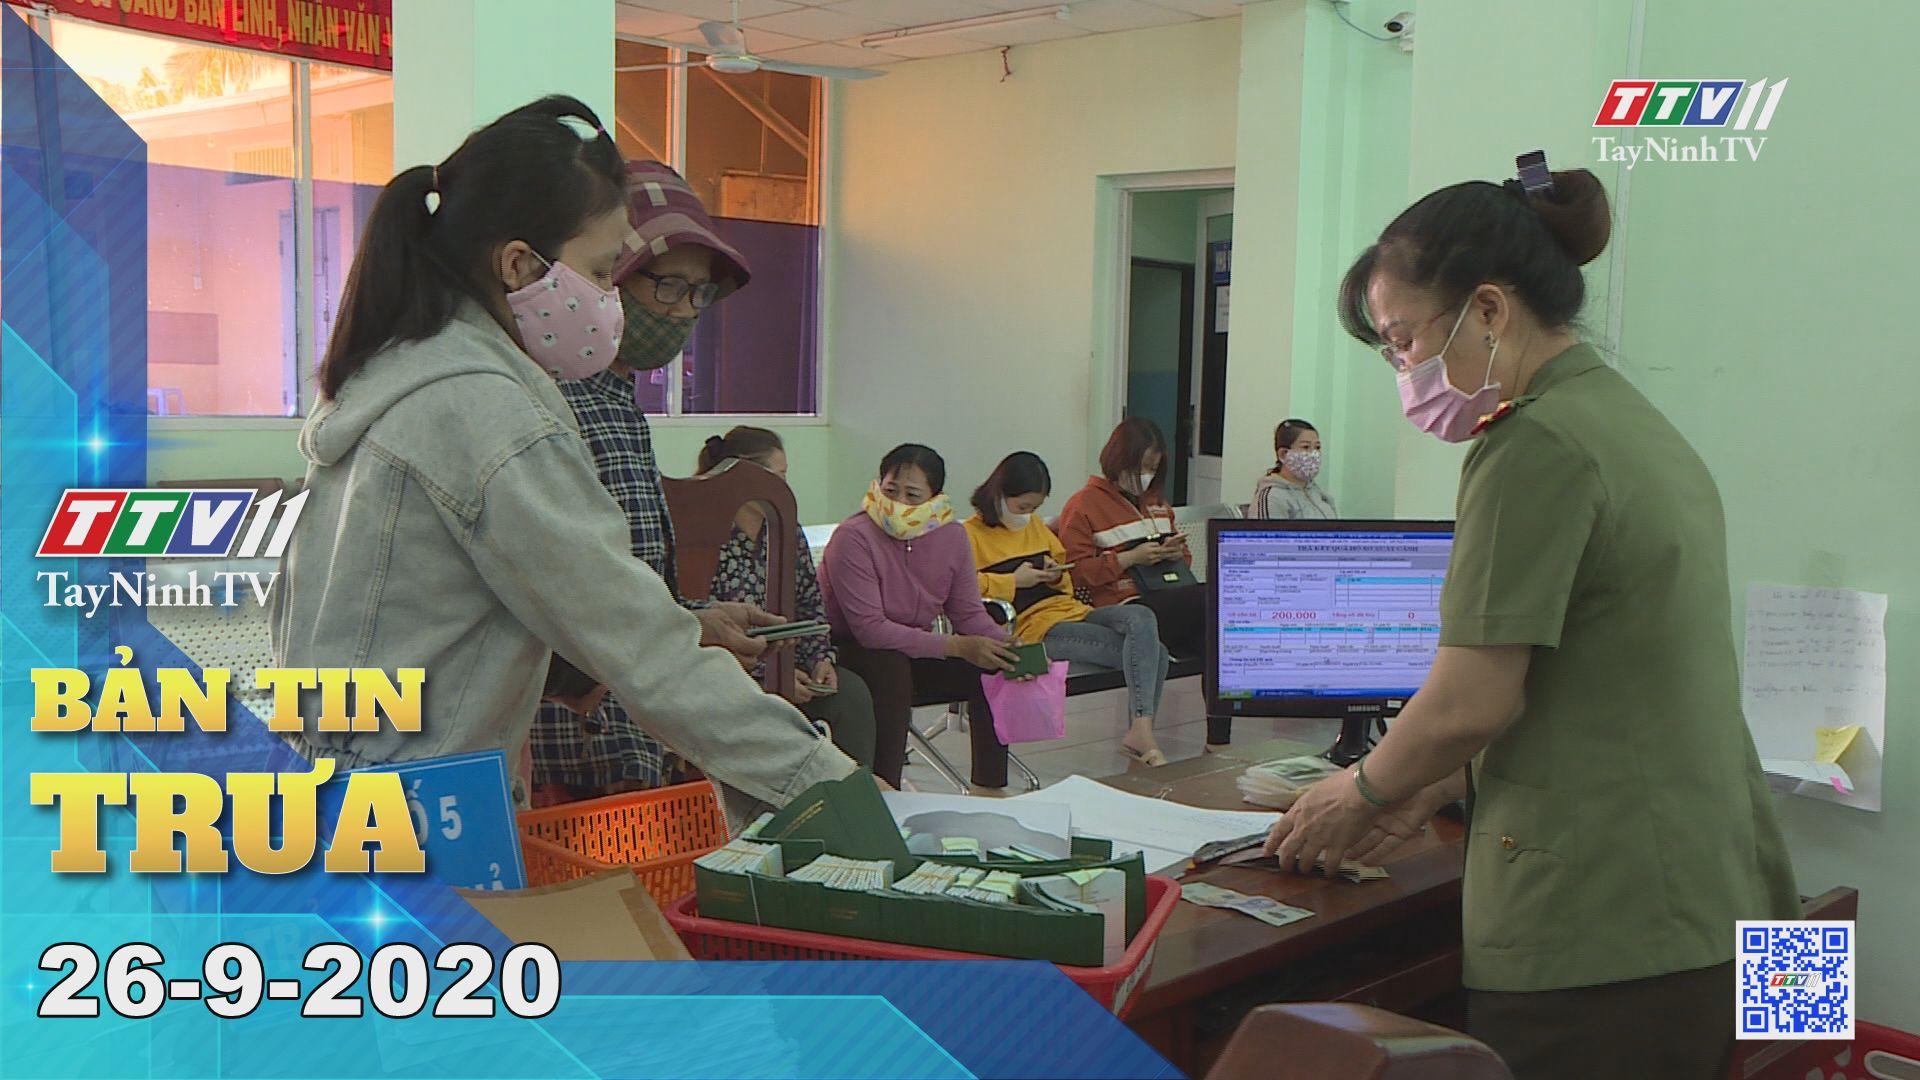 Bản tin trưa 26-9-2020 | Tin tức hôm nay | TayNinhTV